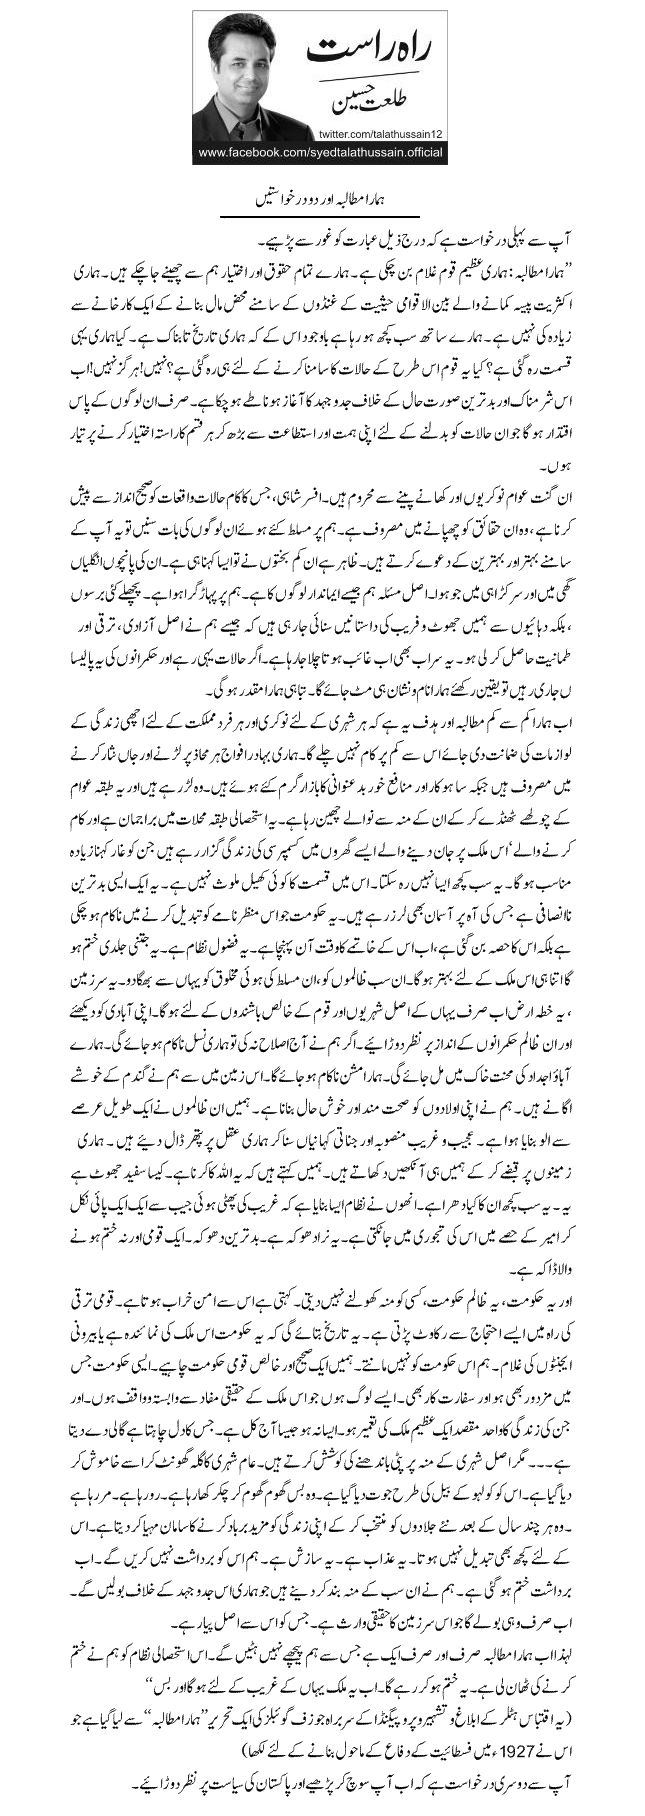 Humara Mutalba 2 darkhwastien 22 Sep 2014 Daily Express News Story